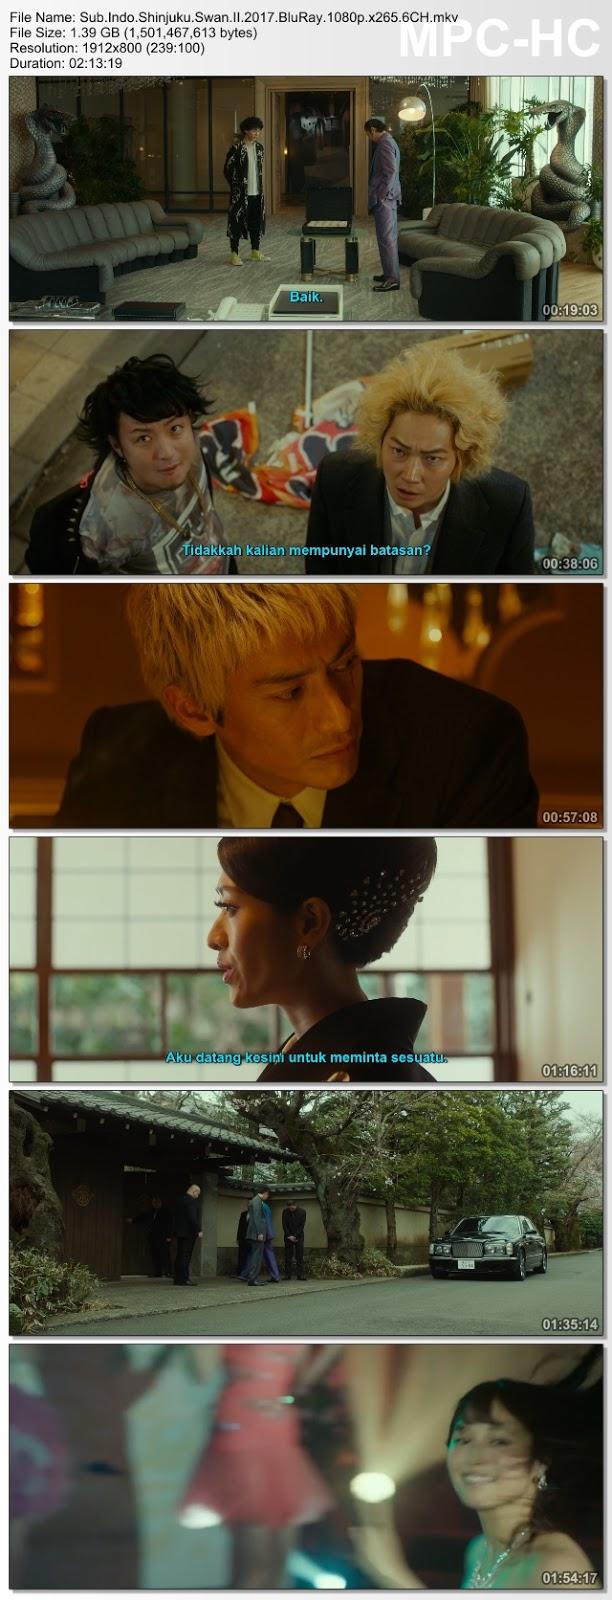 Screenshots Download Film Gratis Shinjuku Suwan II (2017) BluRay 480p MP4 Subtitle Bahasa Indonesia 3GP